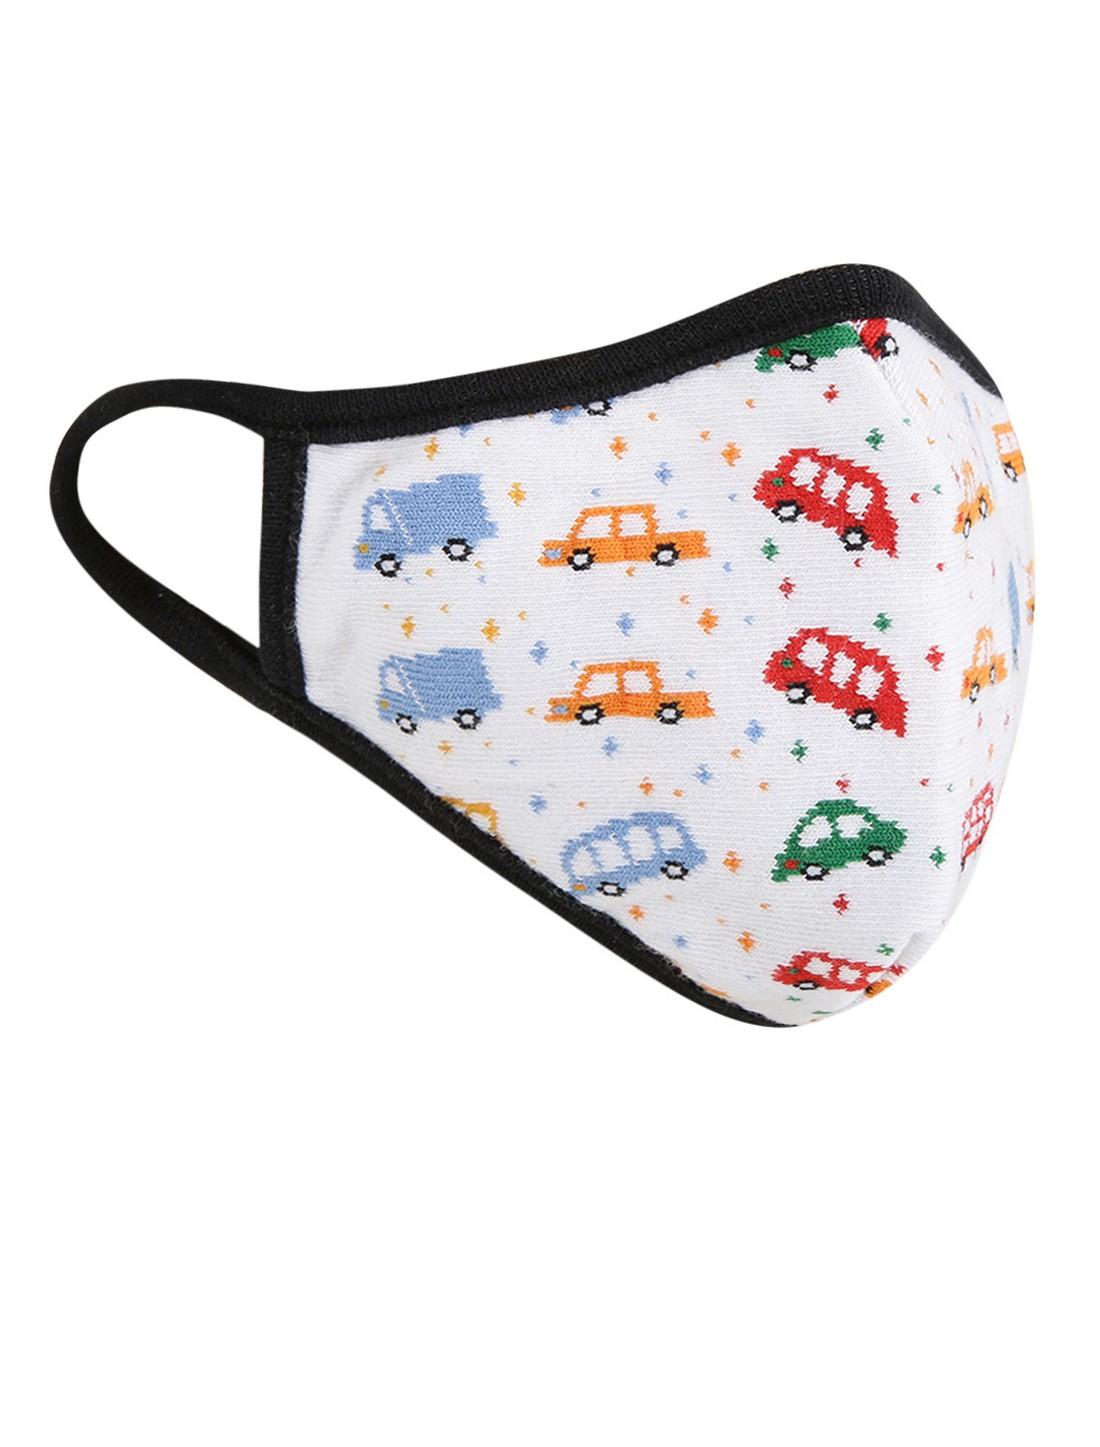 Soxytoes | Soxytoes White Bus Stylish Protective Super Safe Washable Knitted Cotton Kid's Face Mask